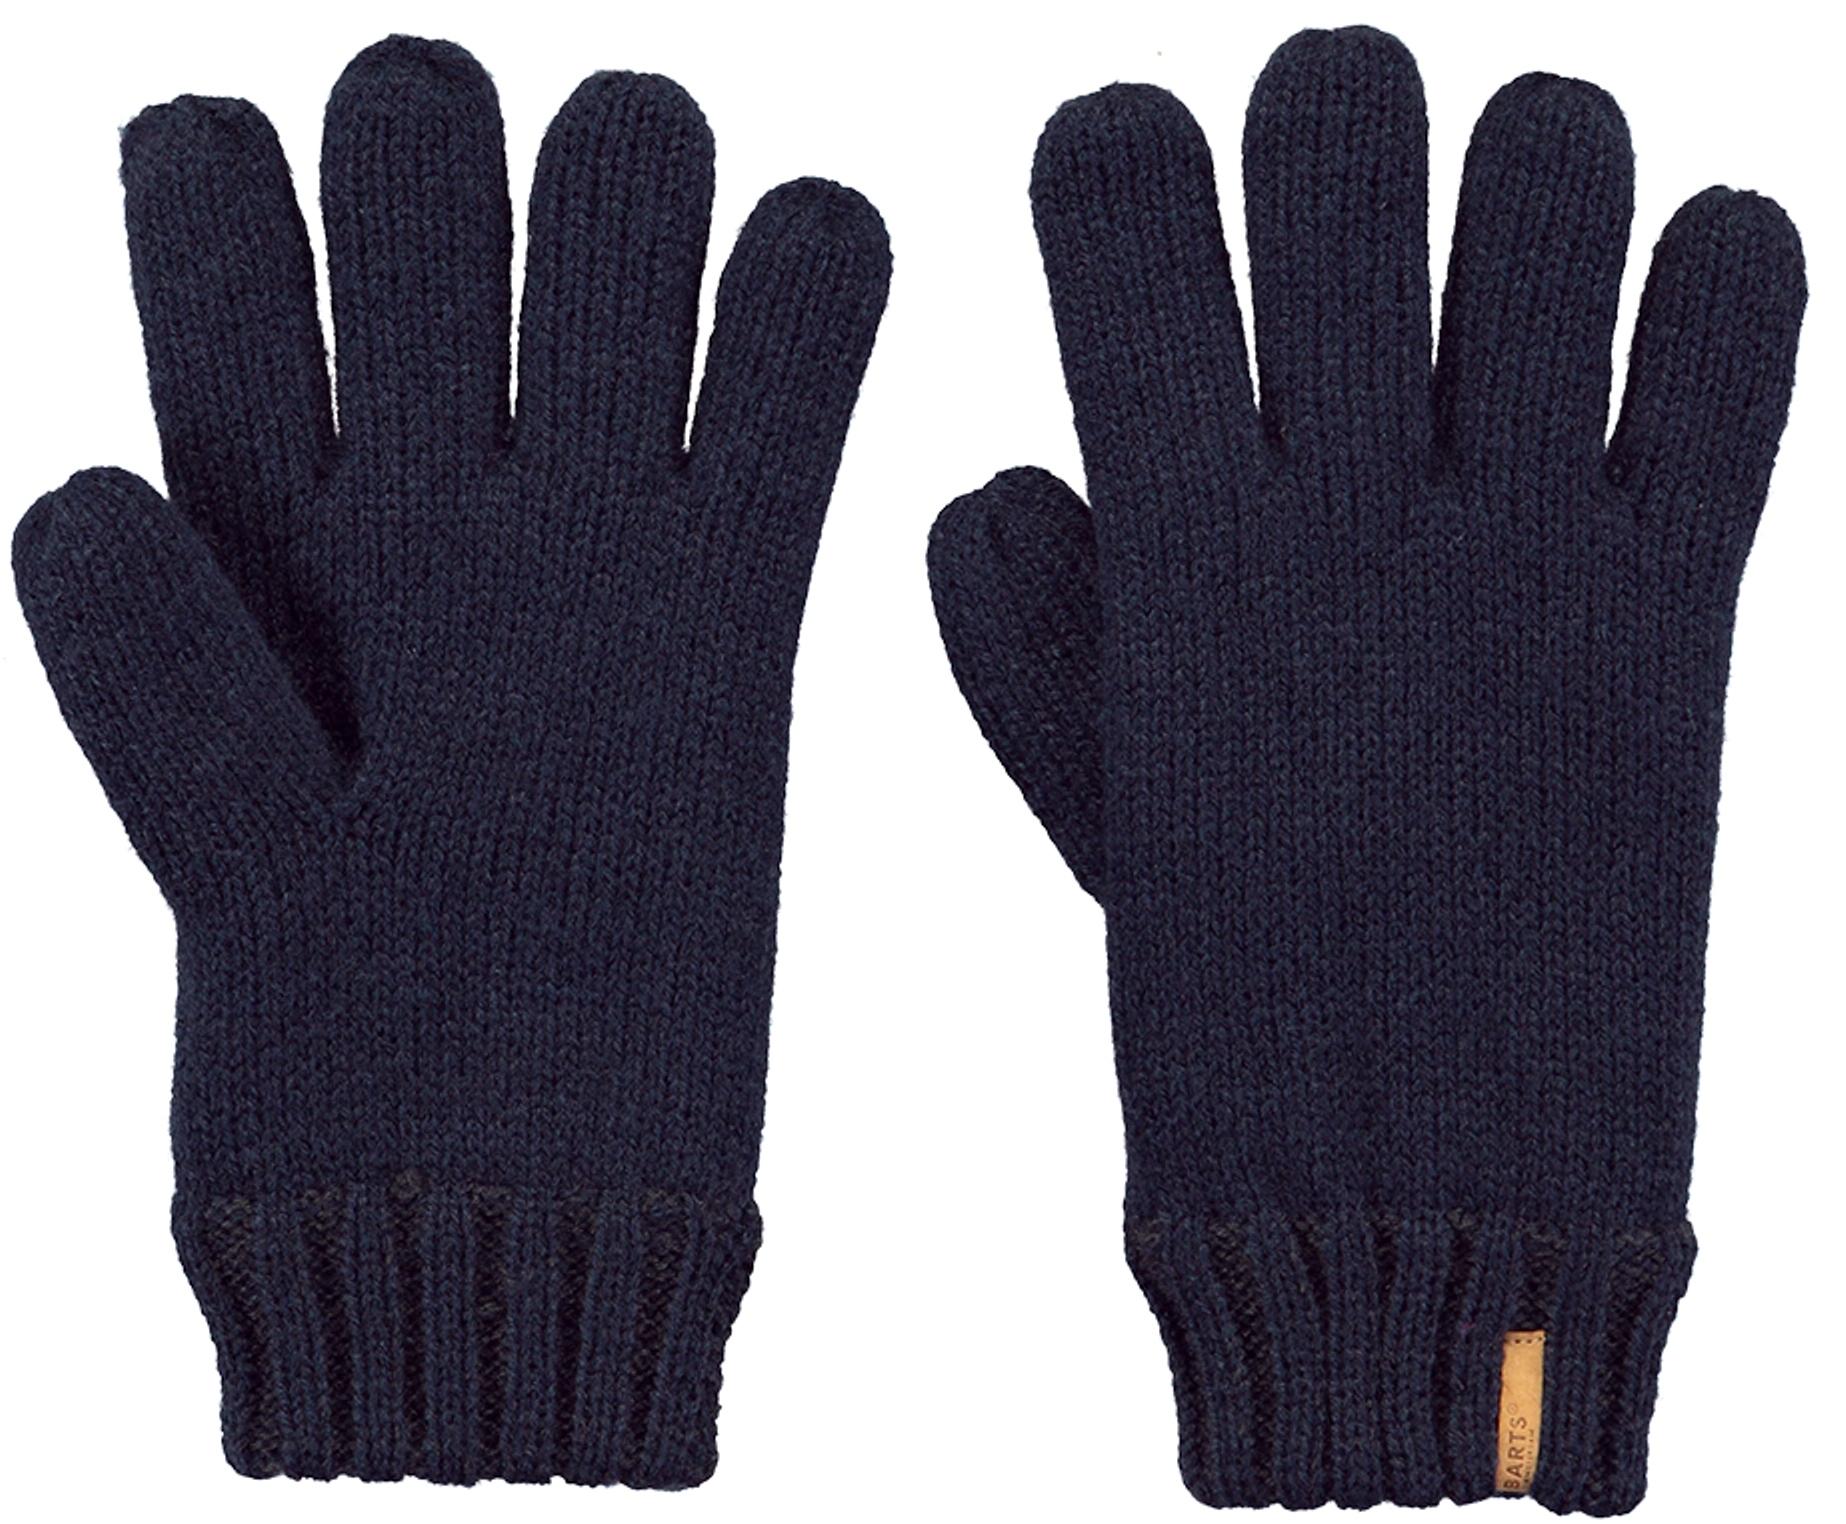 Barts Fingerhandschuh Brighton navy